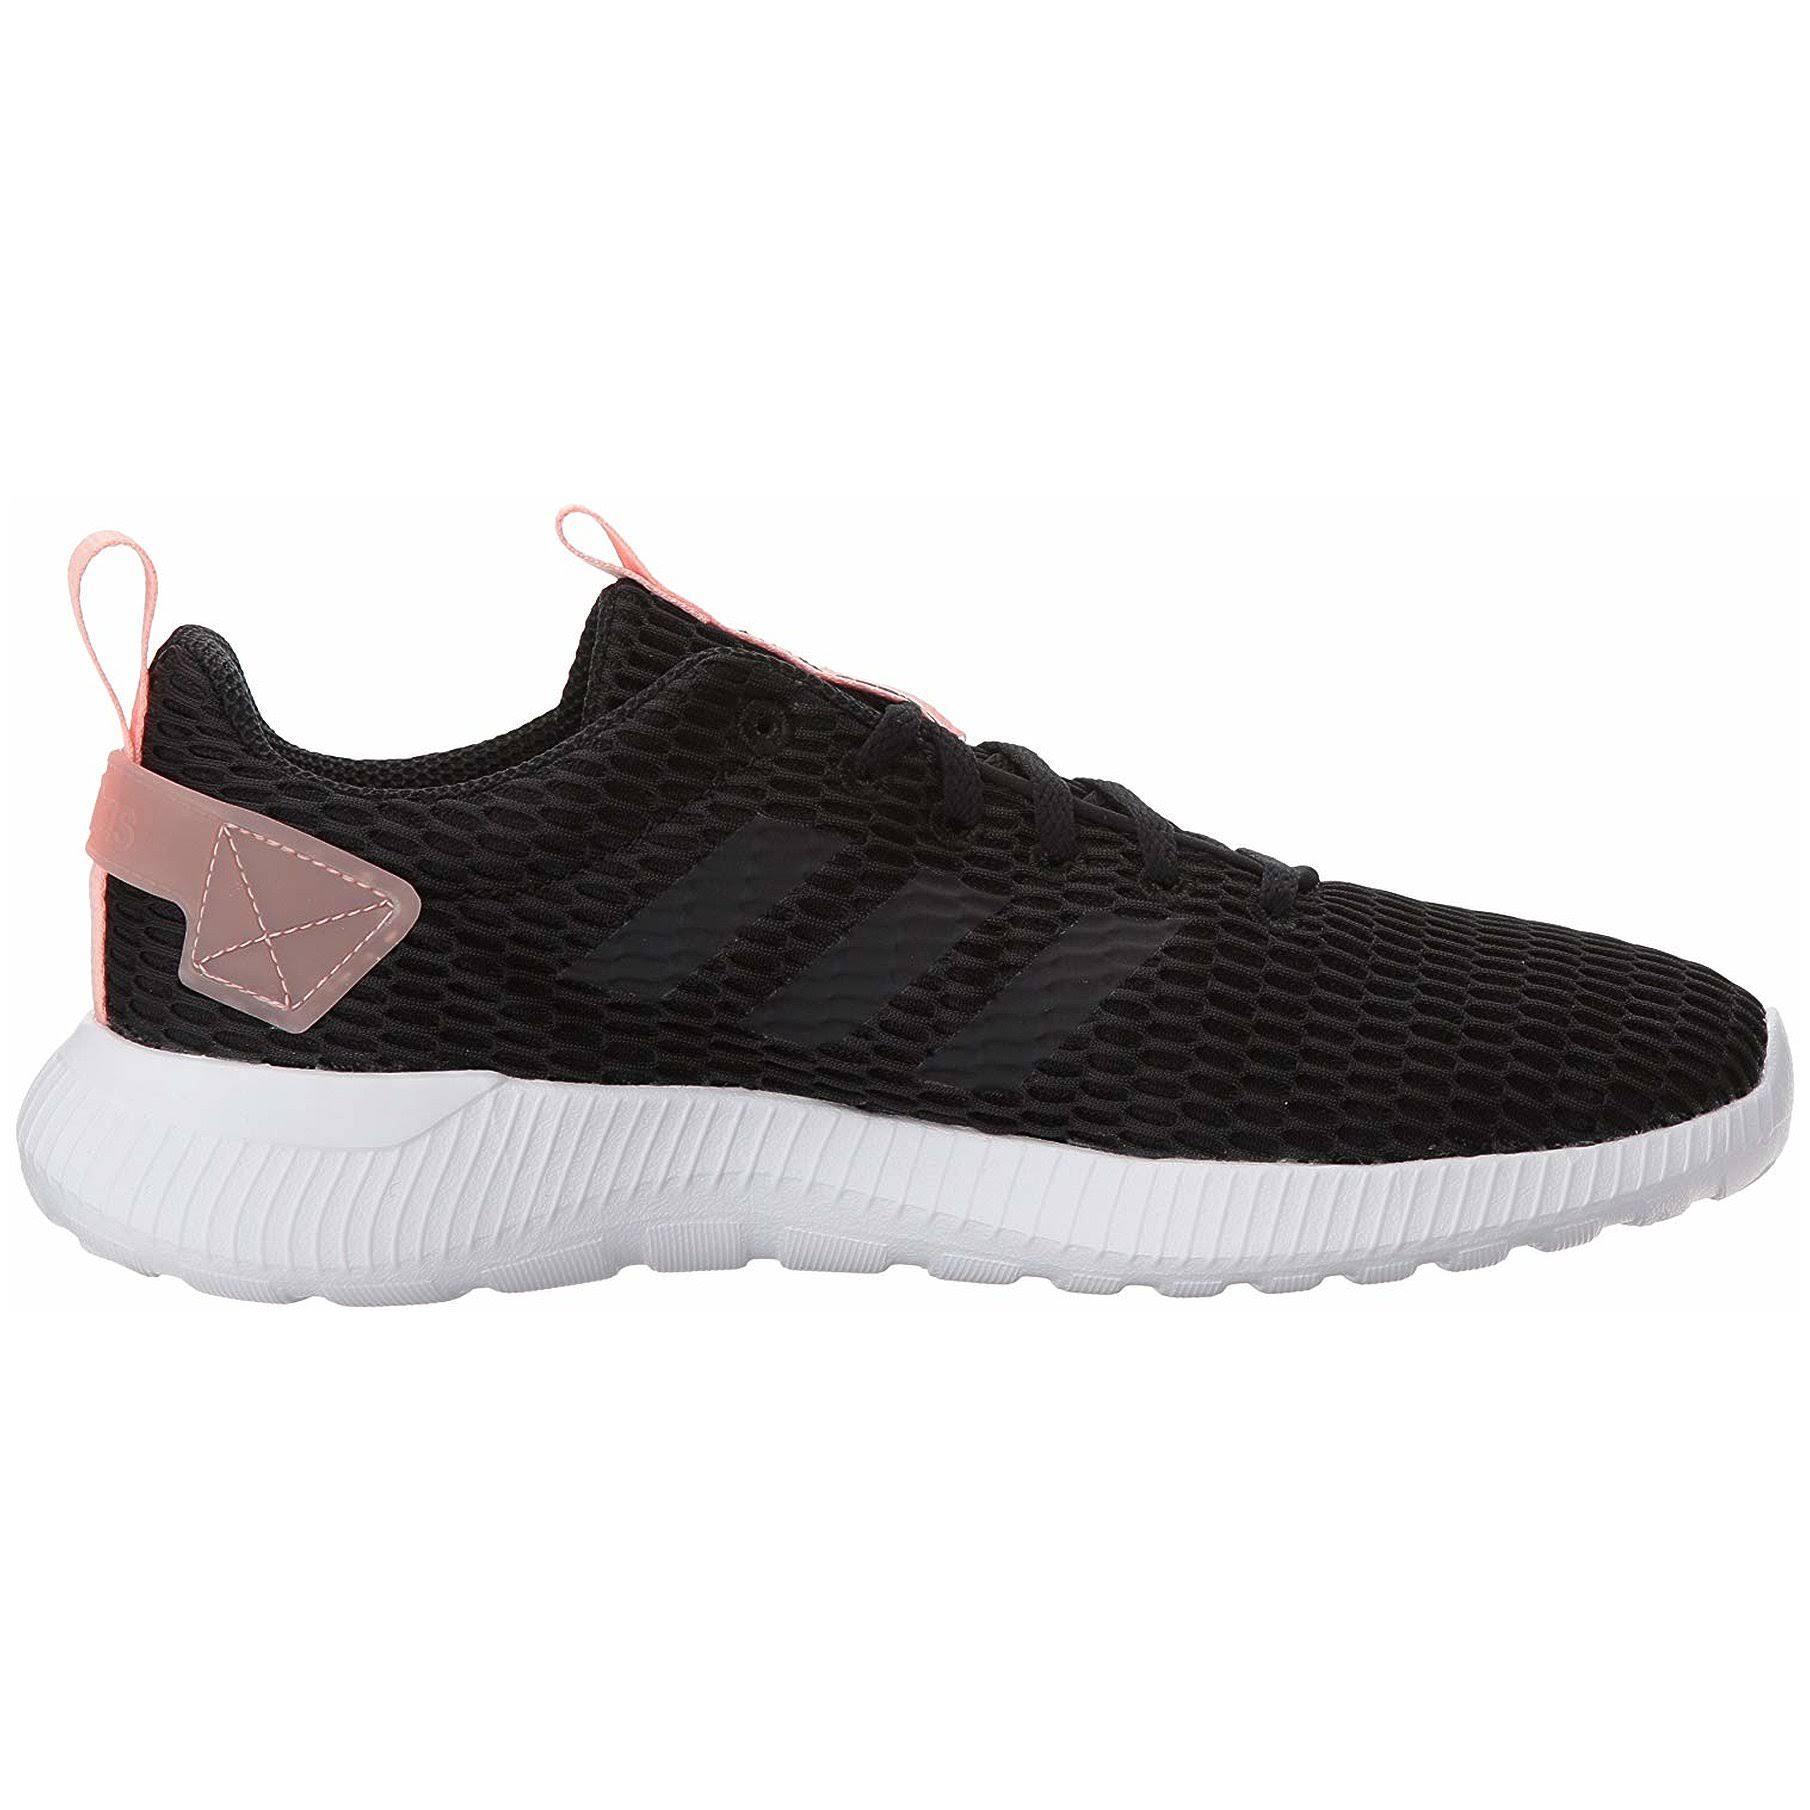 Zapatillas Cloudfoam Para Running Cc Lite De Adidas 9 Racer Mujer Negro Negro RqxrwOCRS1